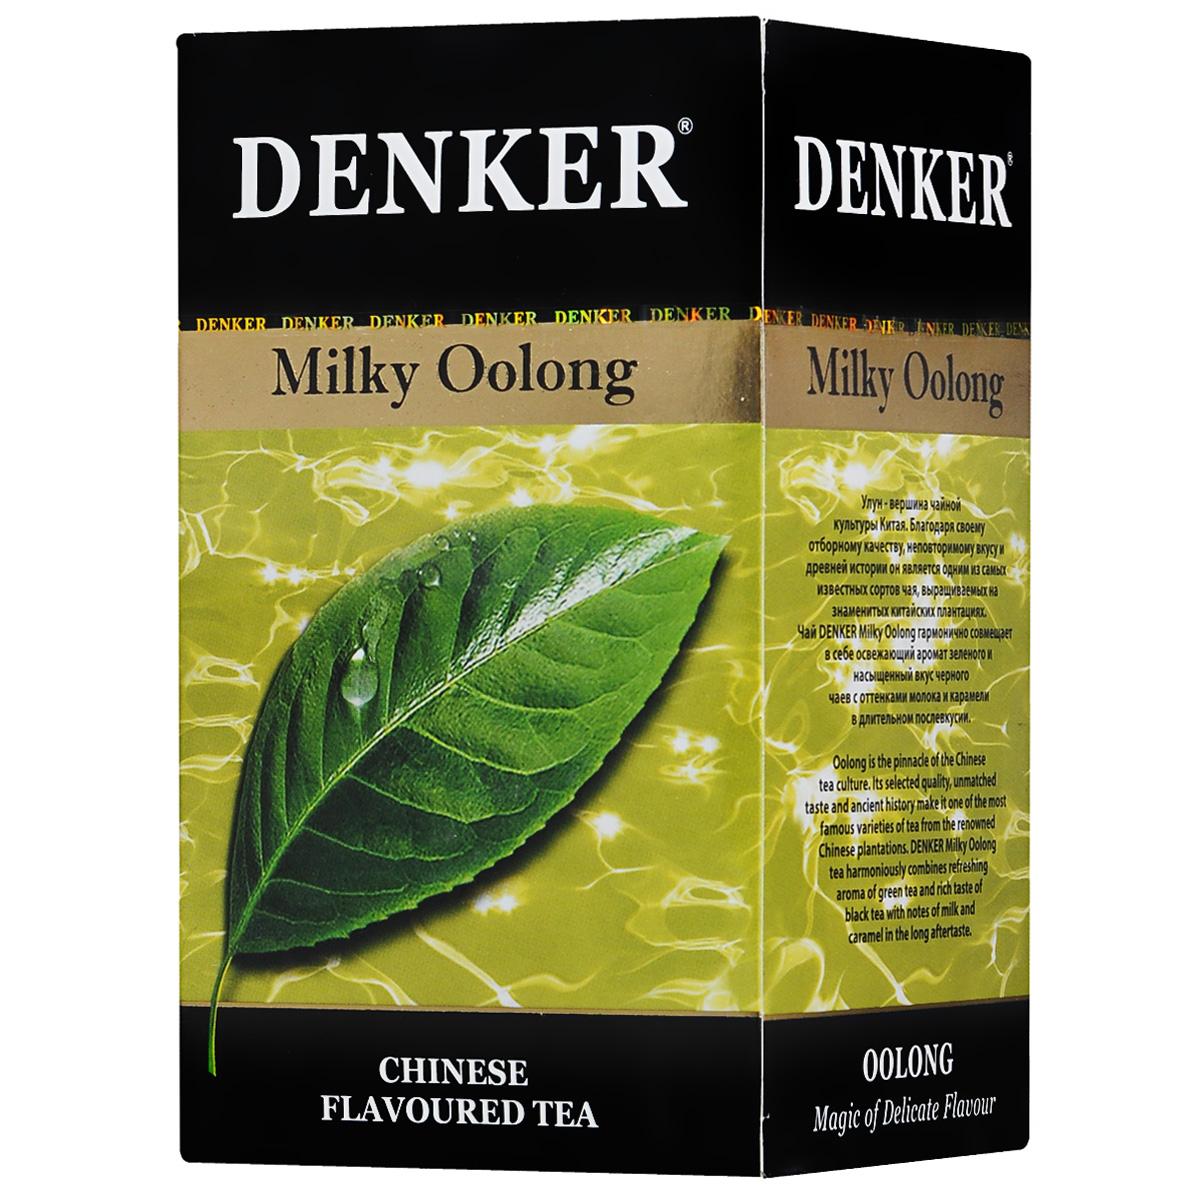 Denker Milky Oolong зеленый ароматизированный чай в пакетиках, 20 шт greenfield milky oolong чай улун в пирамидках 20 шт